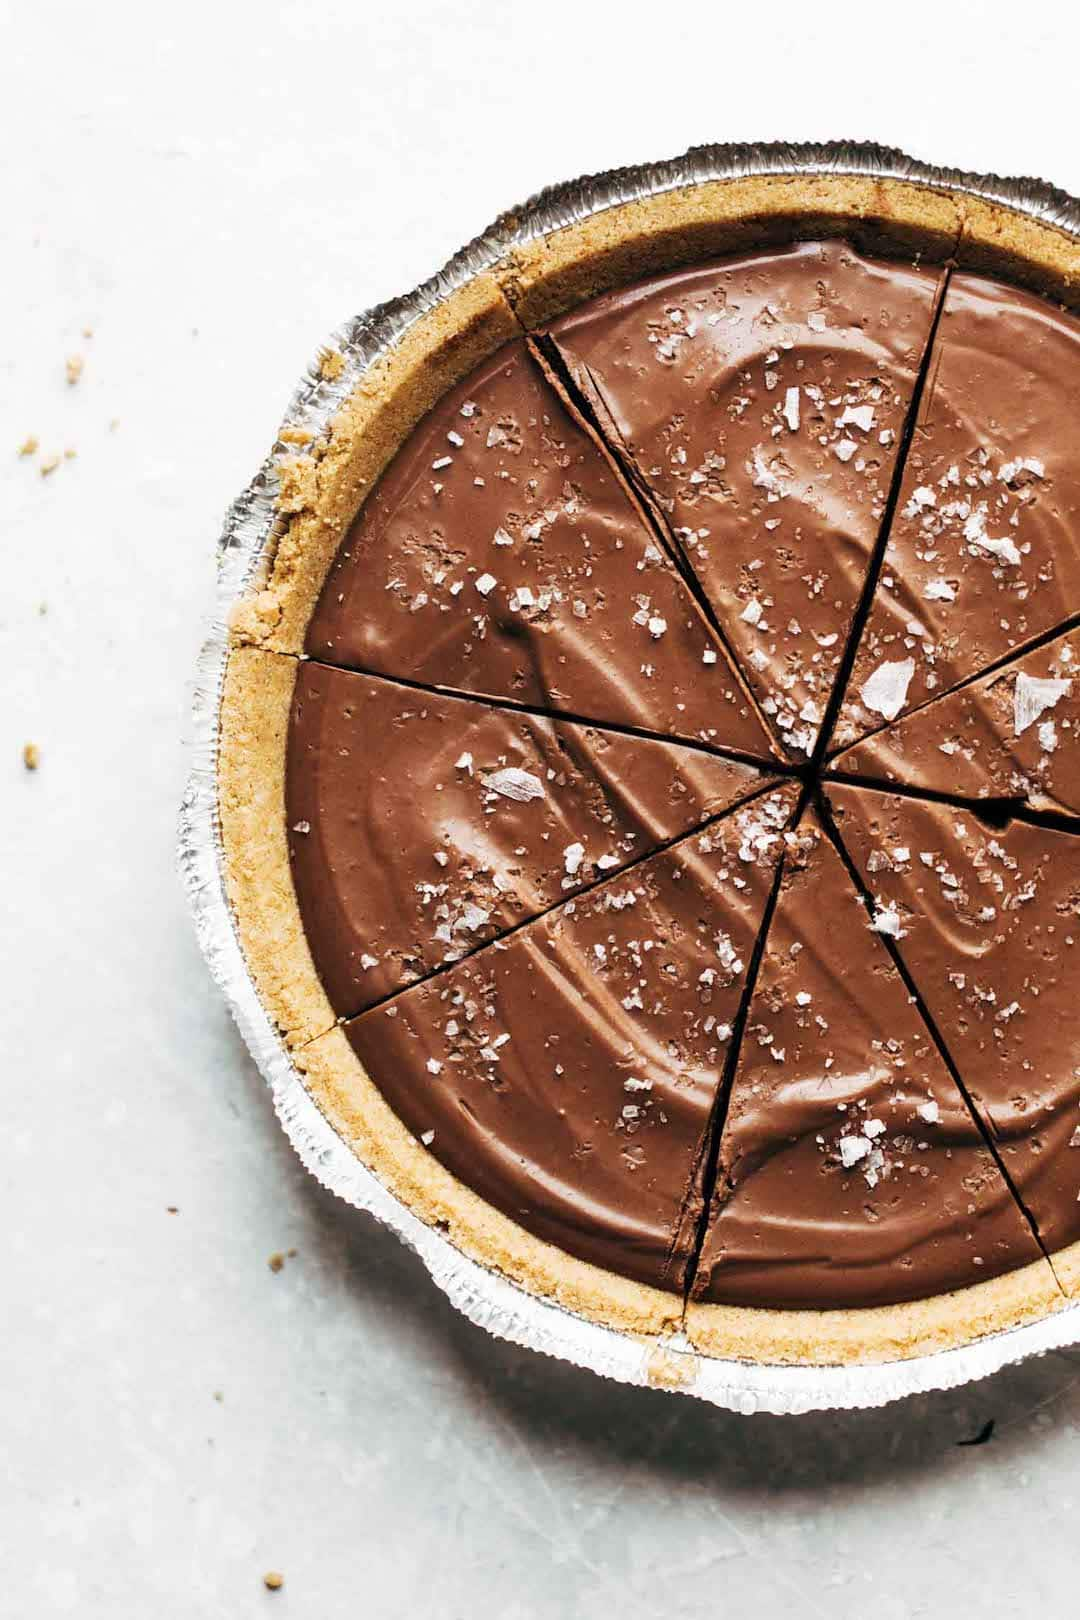 12 Super Easy Plant Based Desserts - Vegan Chocolate Pie